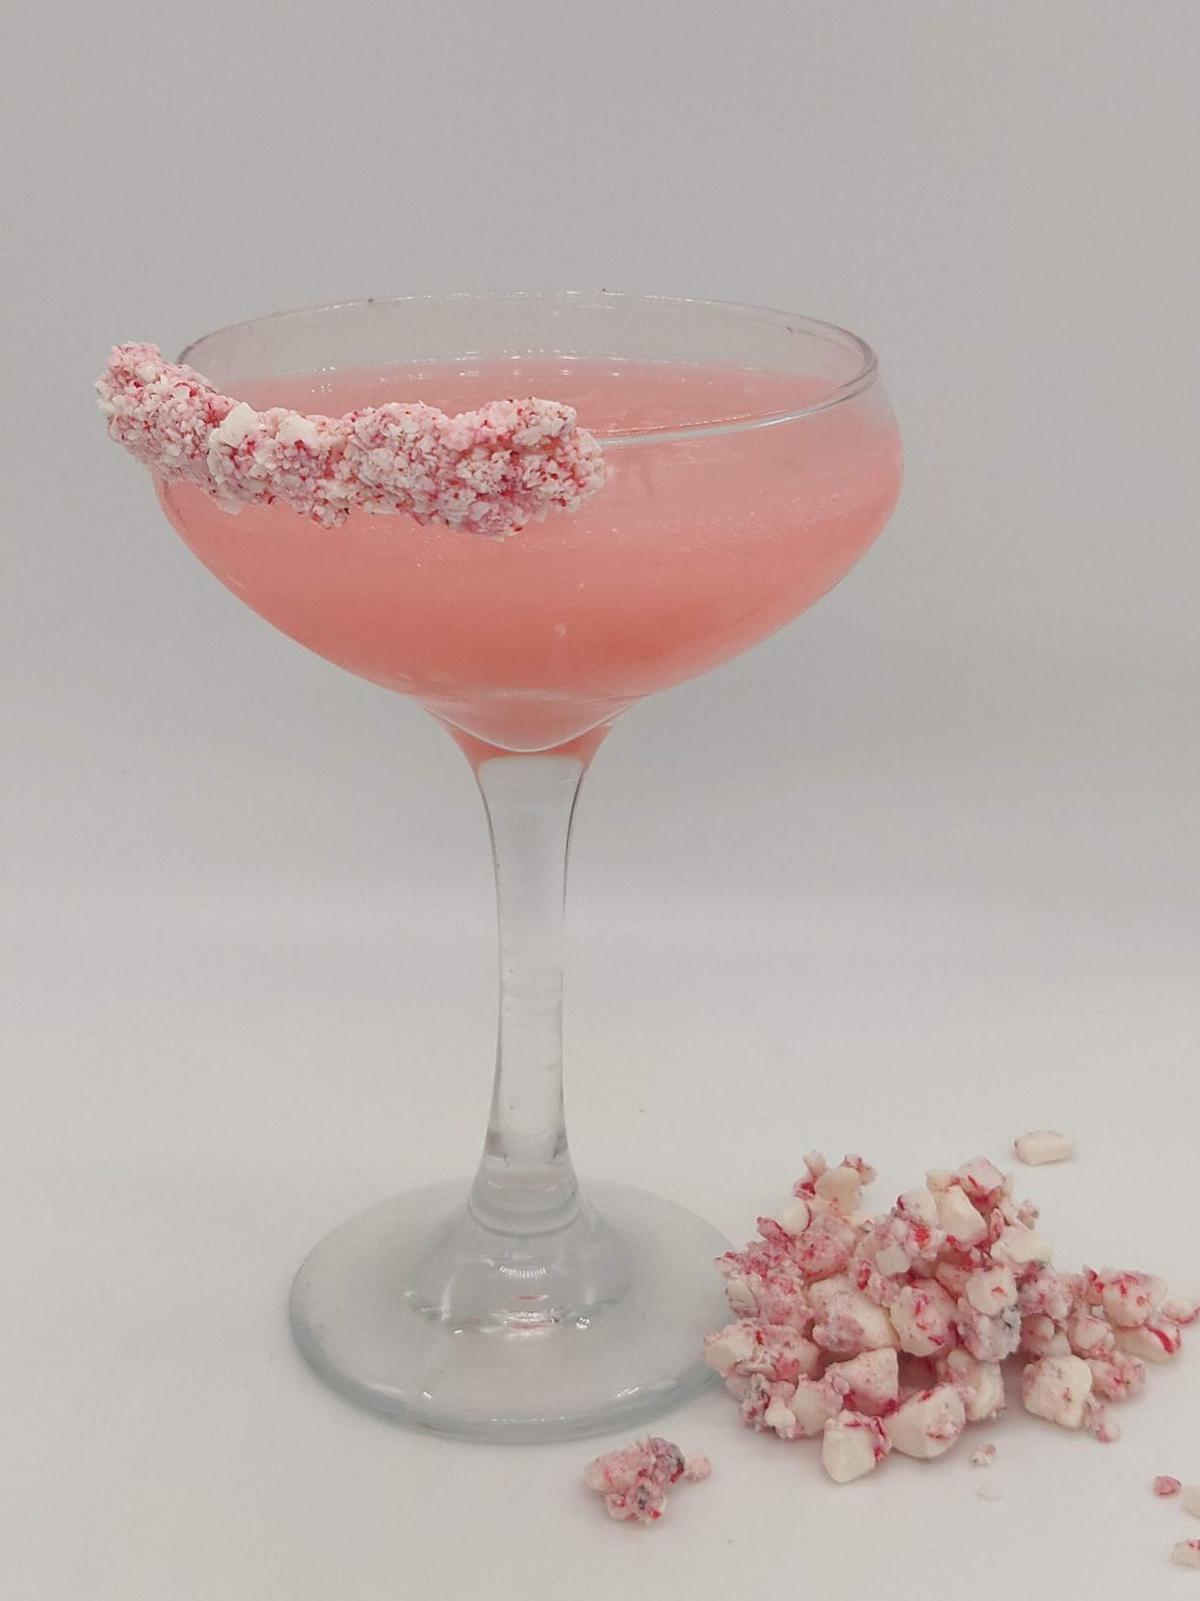 Candy Cane martini neros